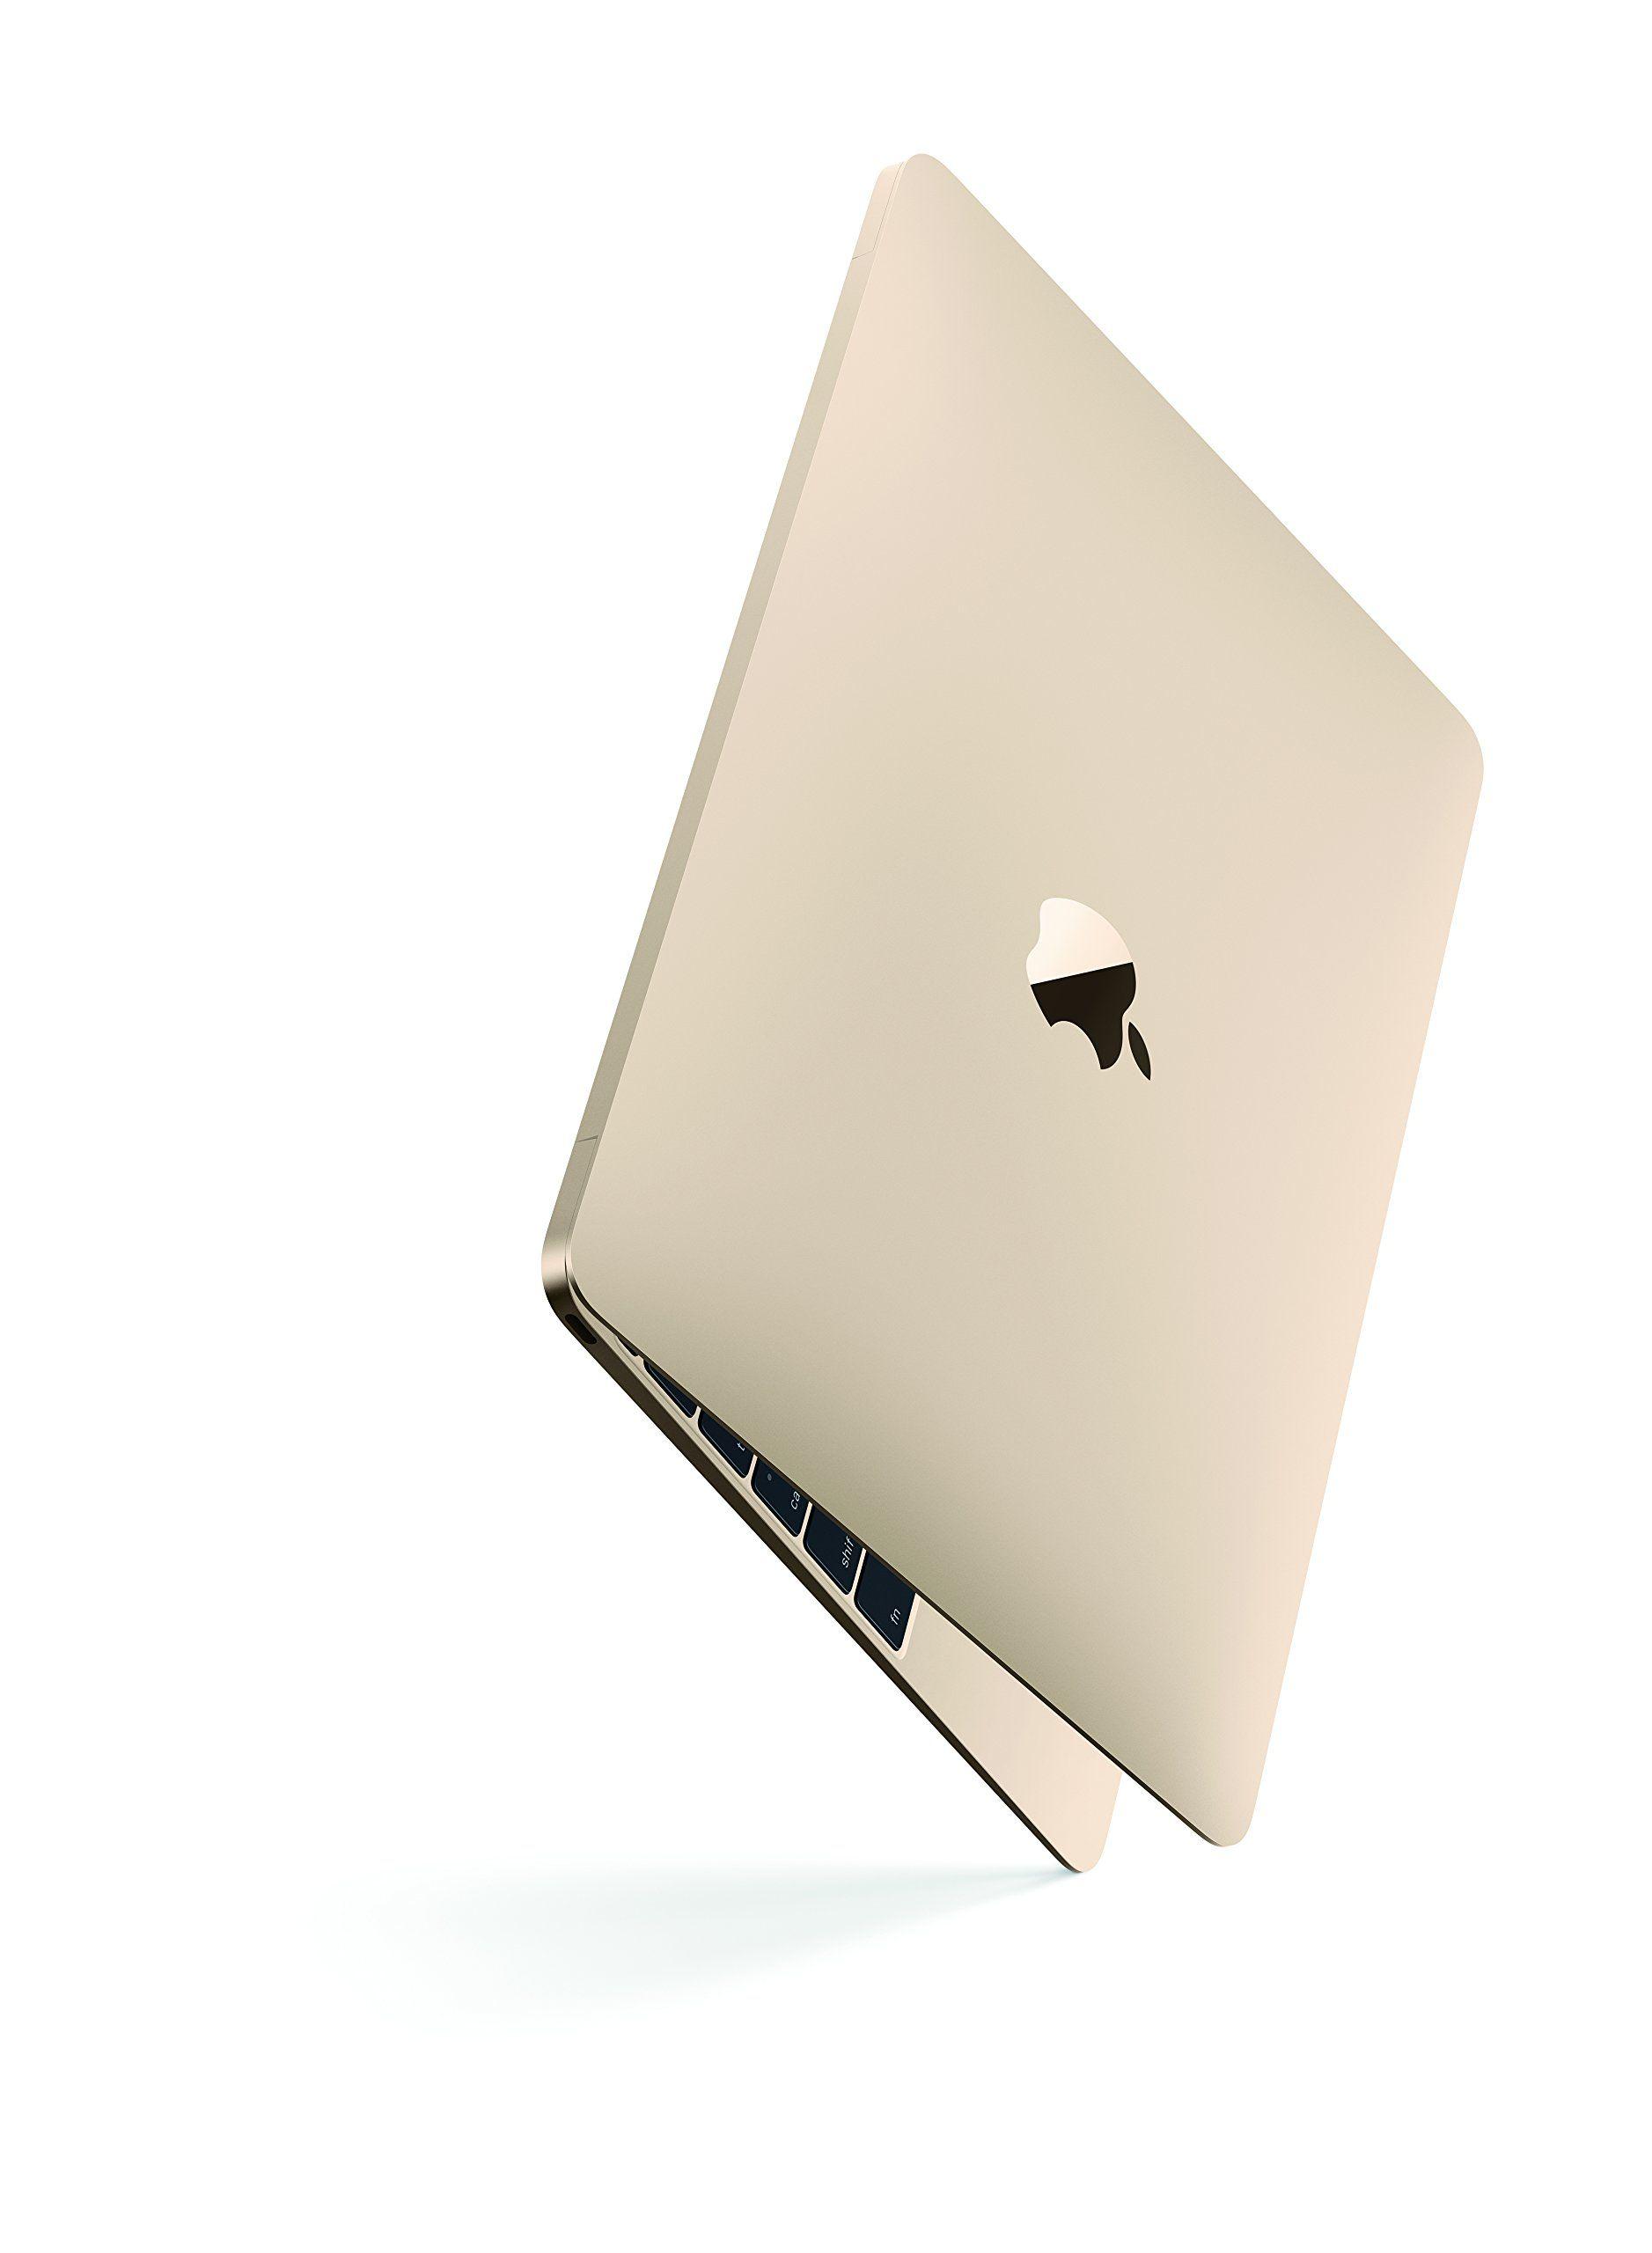 Amazon Com Apple Macbook Mk4m2ll A 12 Inch Laptop With Retina Display Gold 256 Gb Computers Accessories Mac Notebook Apple Accessories Apple Laptop